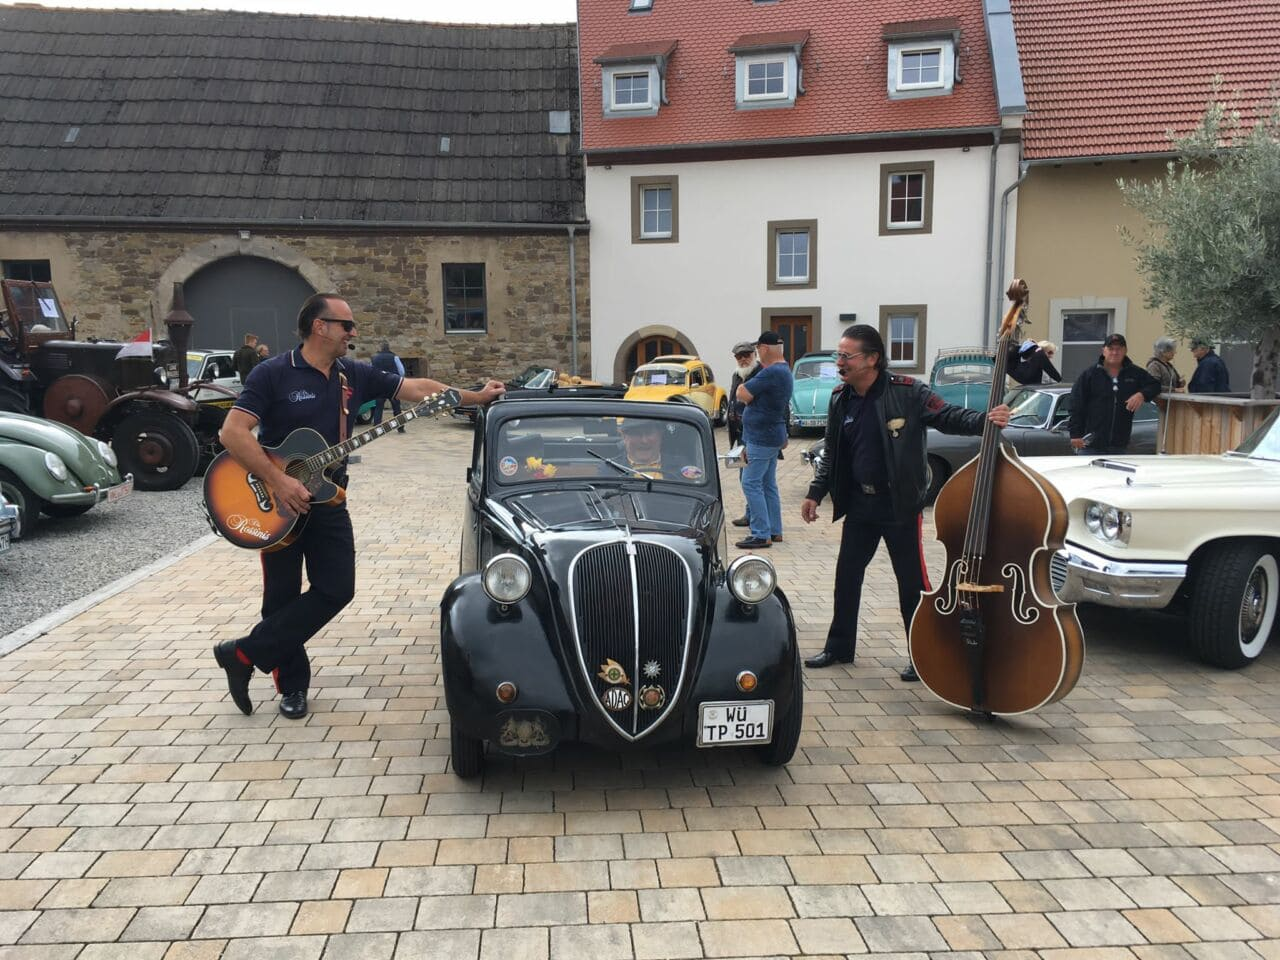 Oldtimer-Fest auf Gut Wöllried